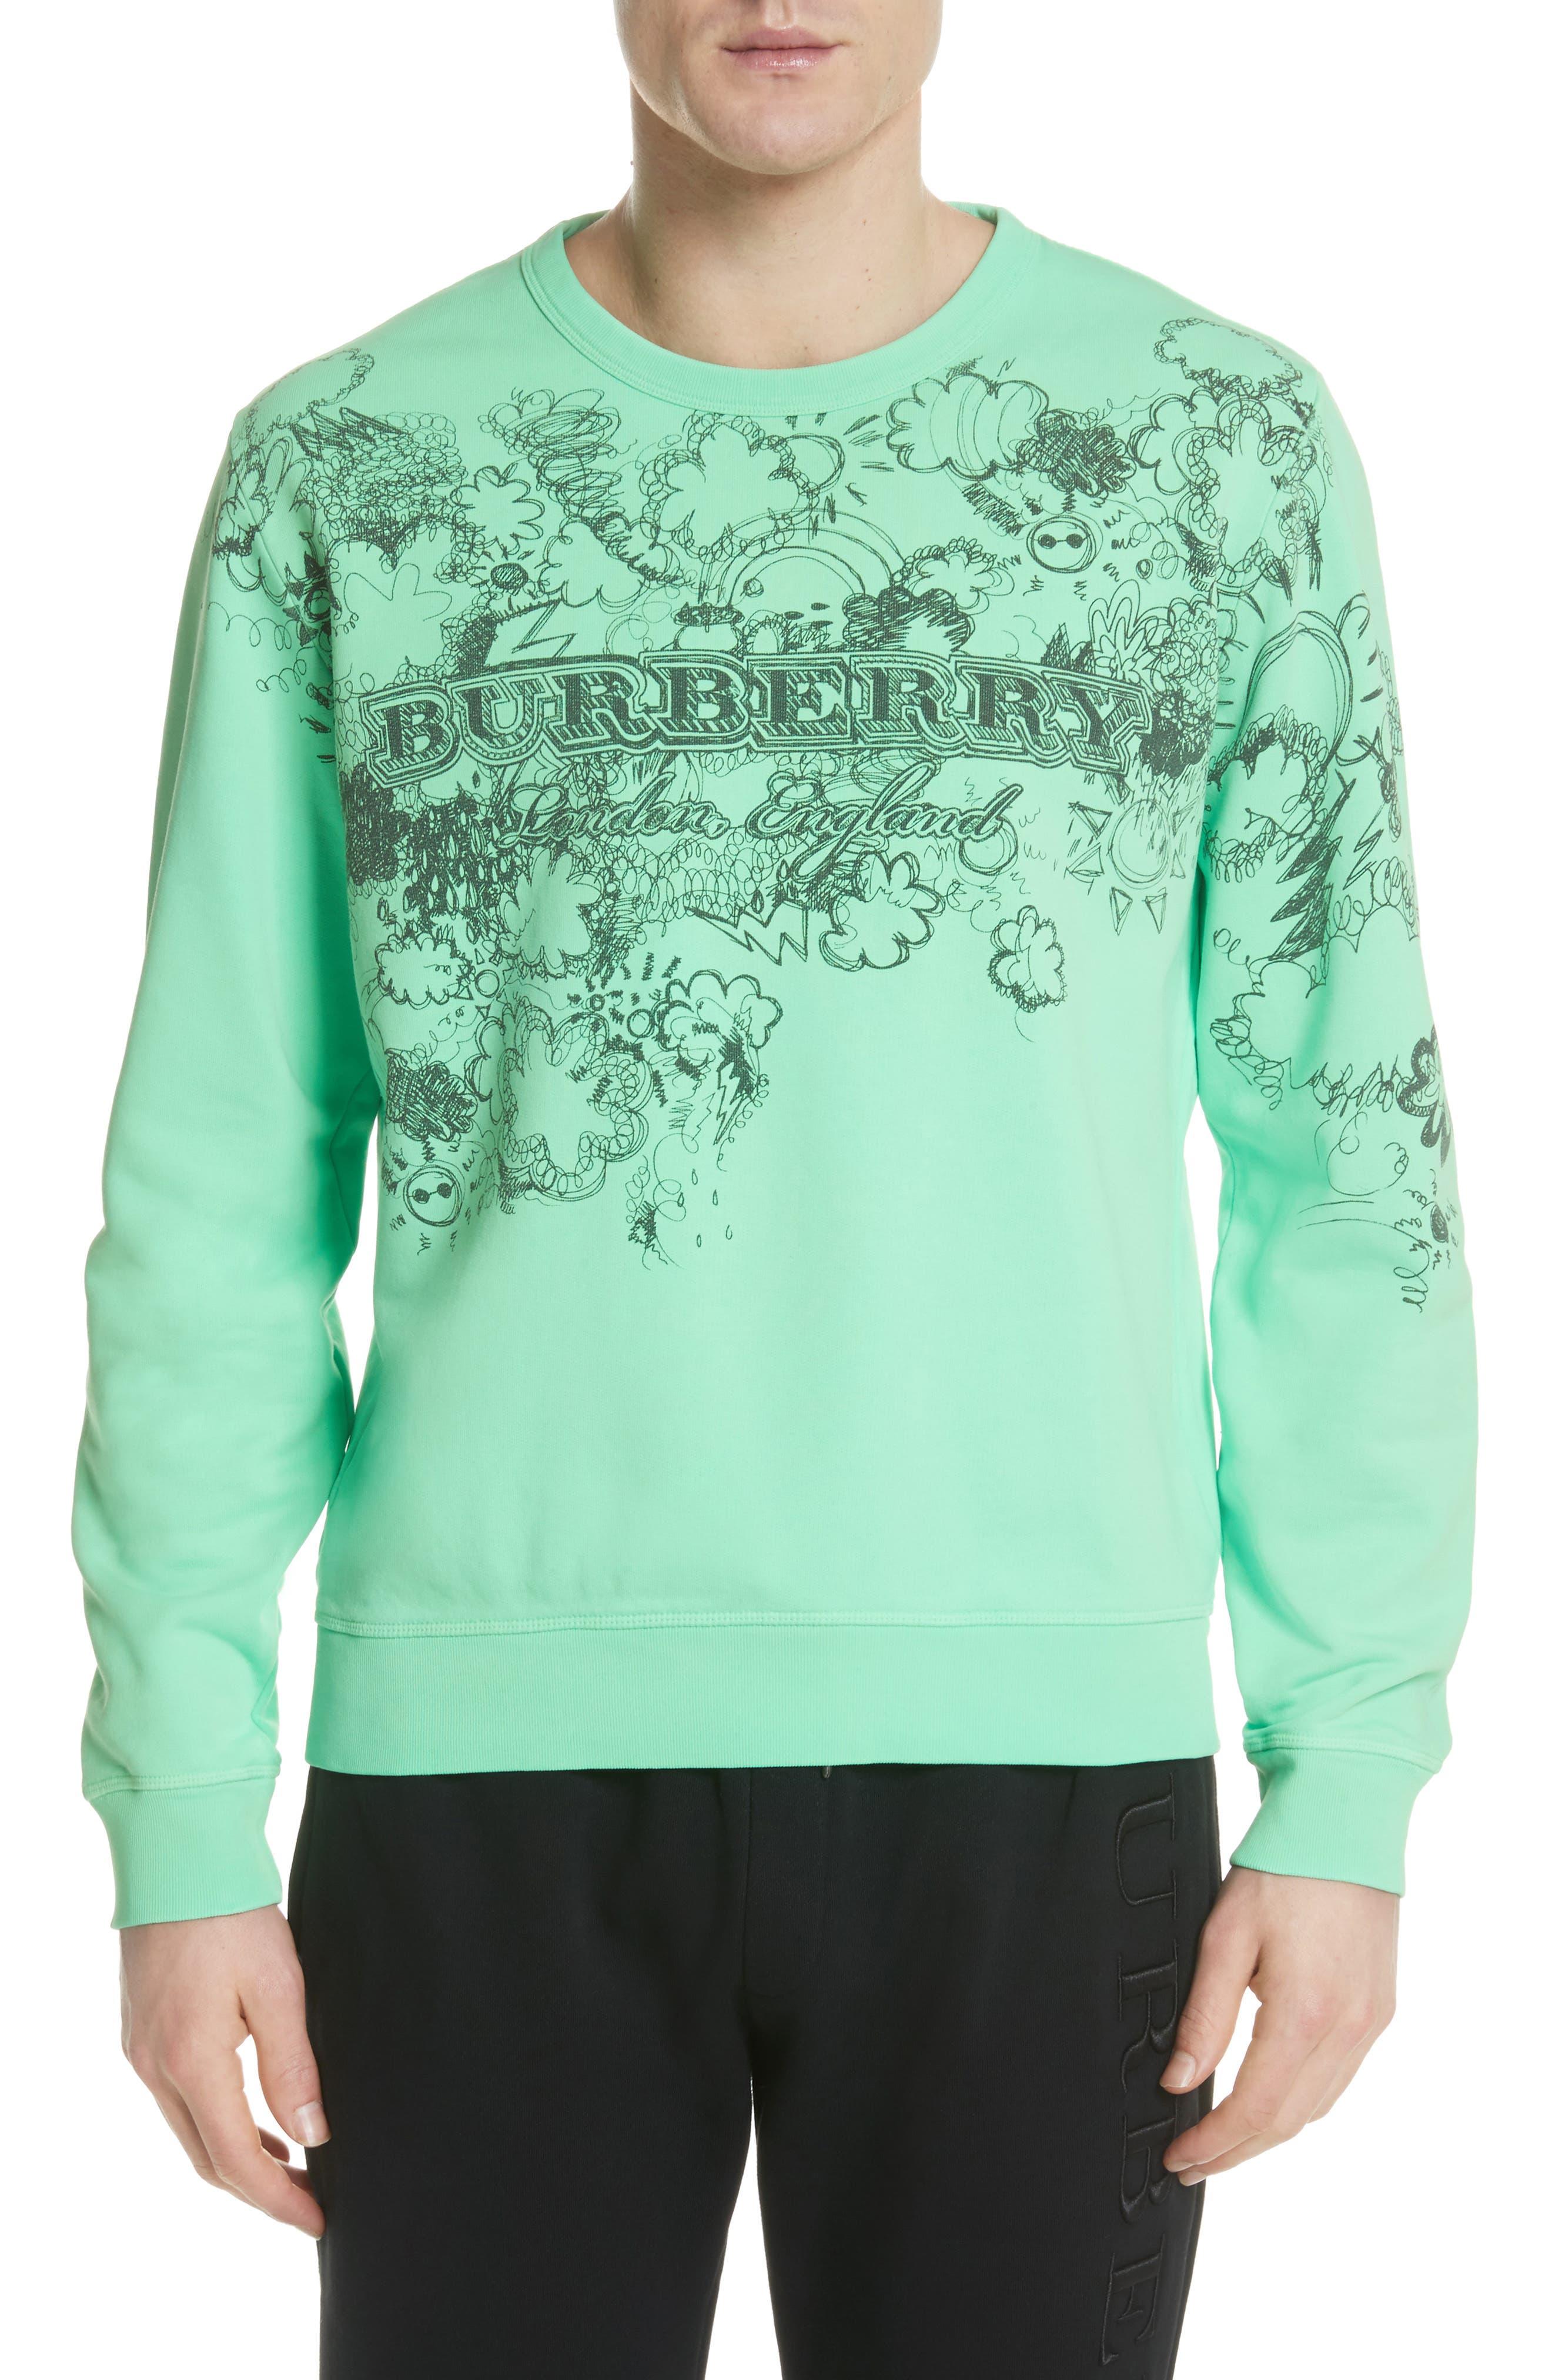 Madon Graphic Sweatshirt,                         Main,                         color, 300